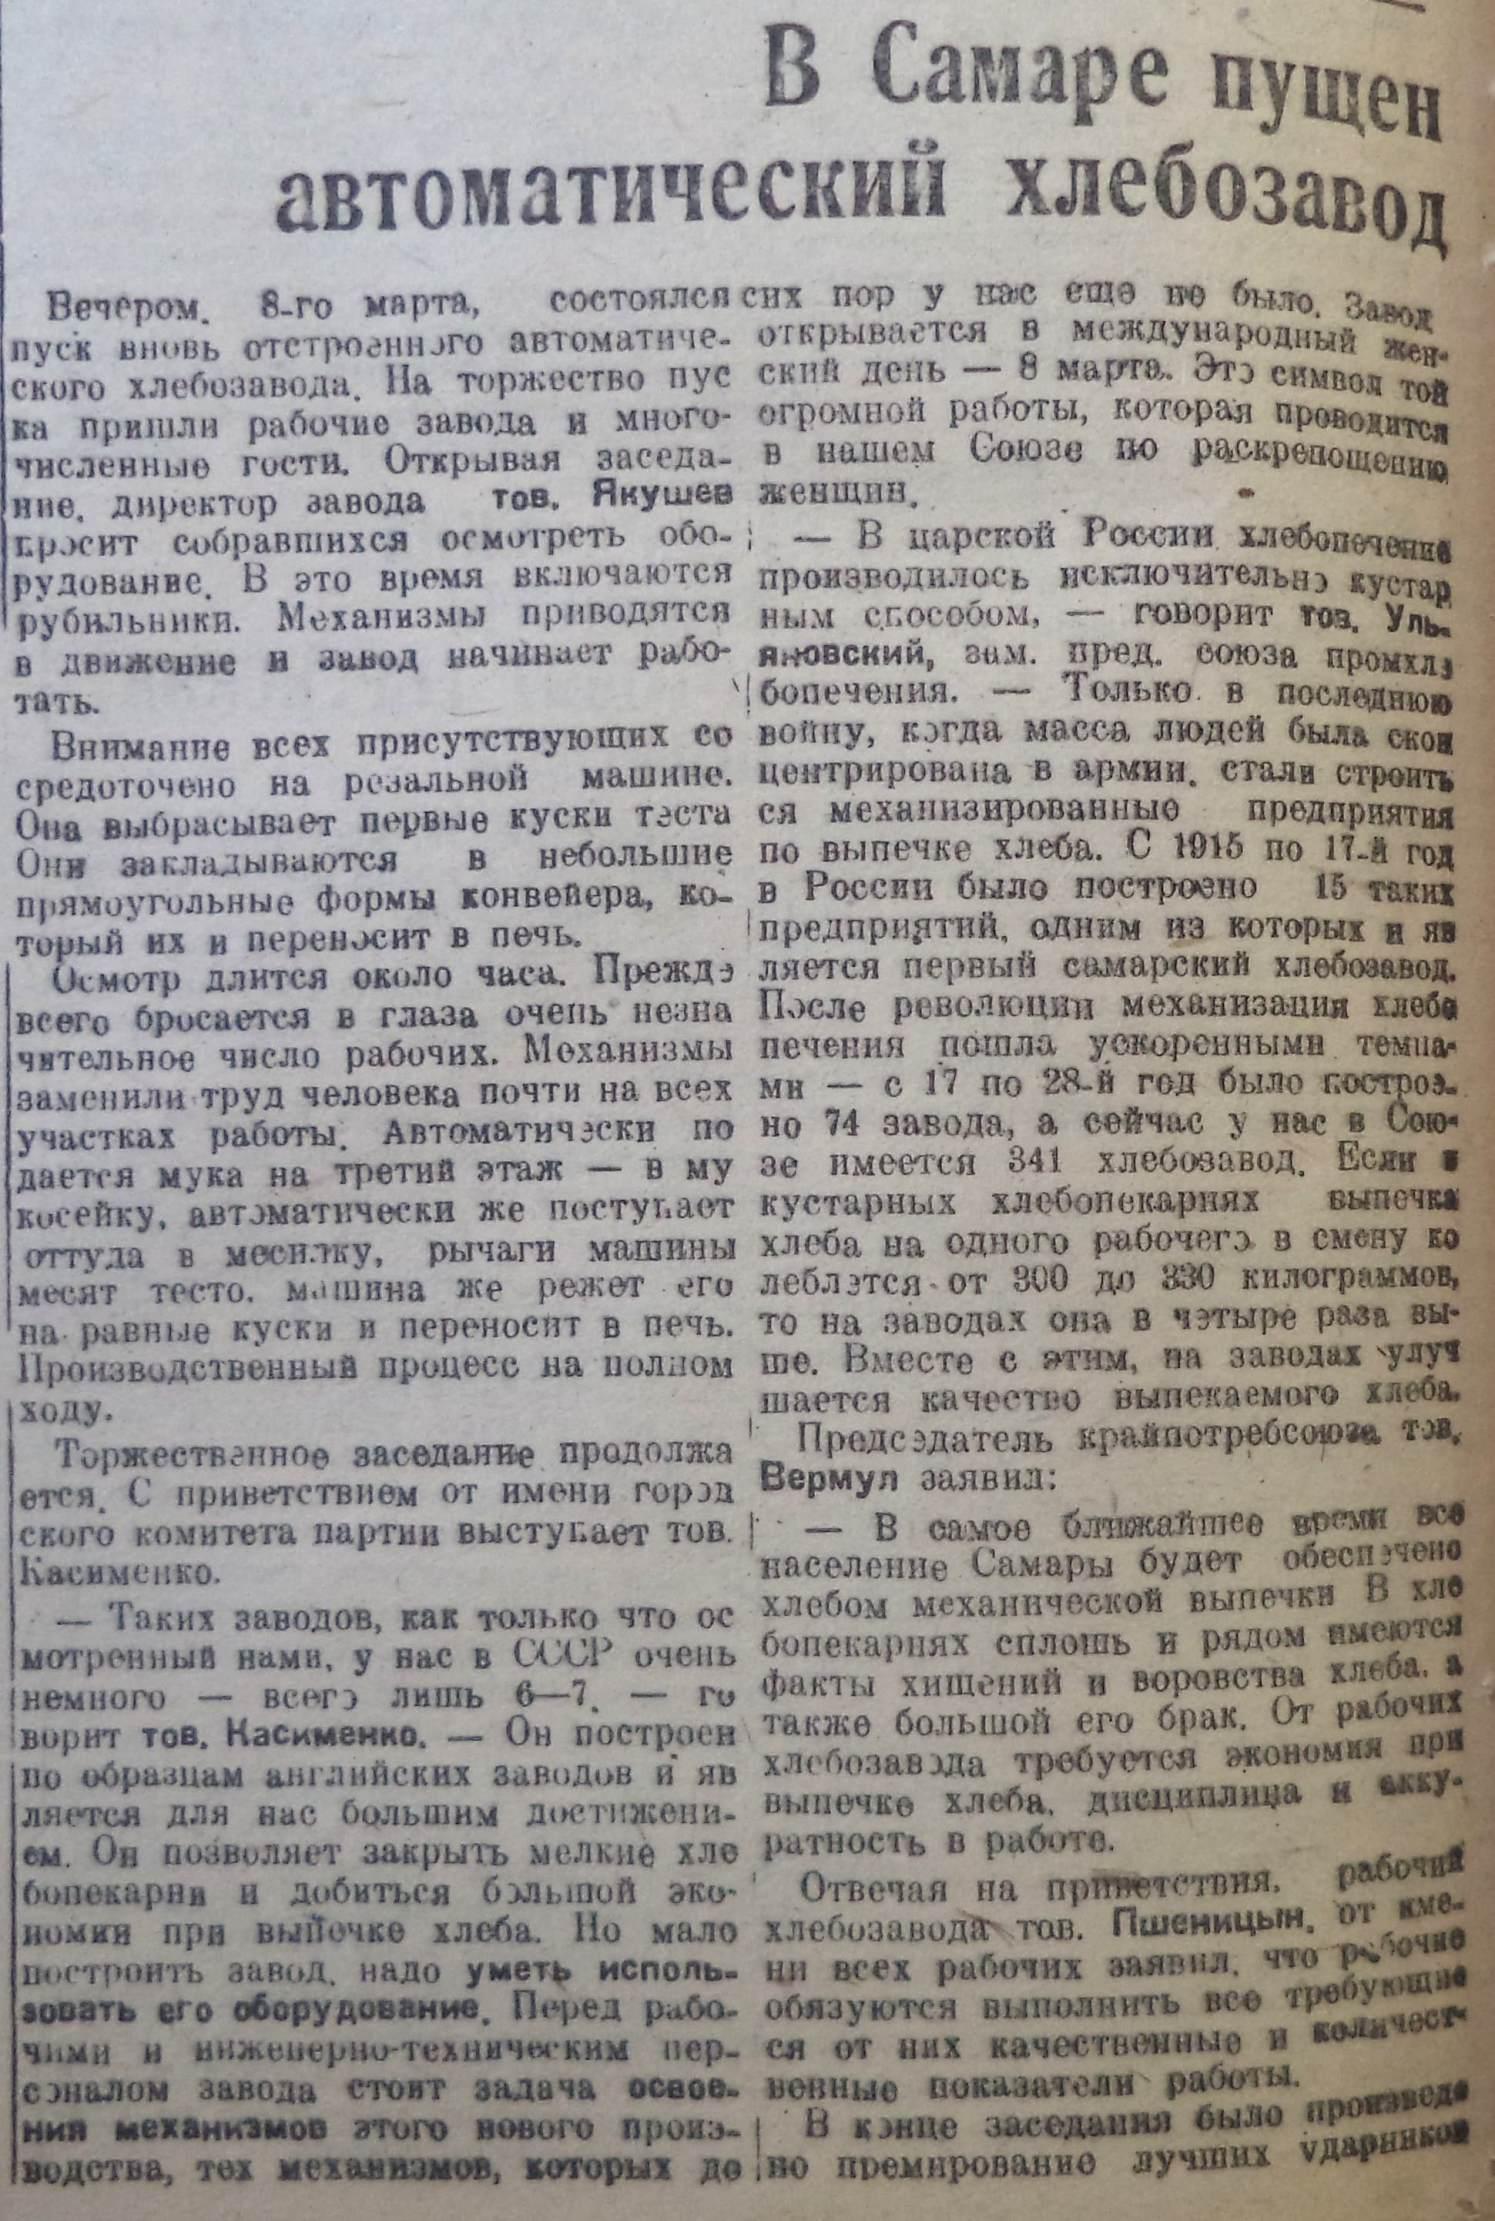 Спортивная-ФОТО-32-РабСам-1933-03-12-пуск автоматич. хлебоз-да-min